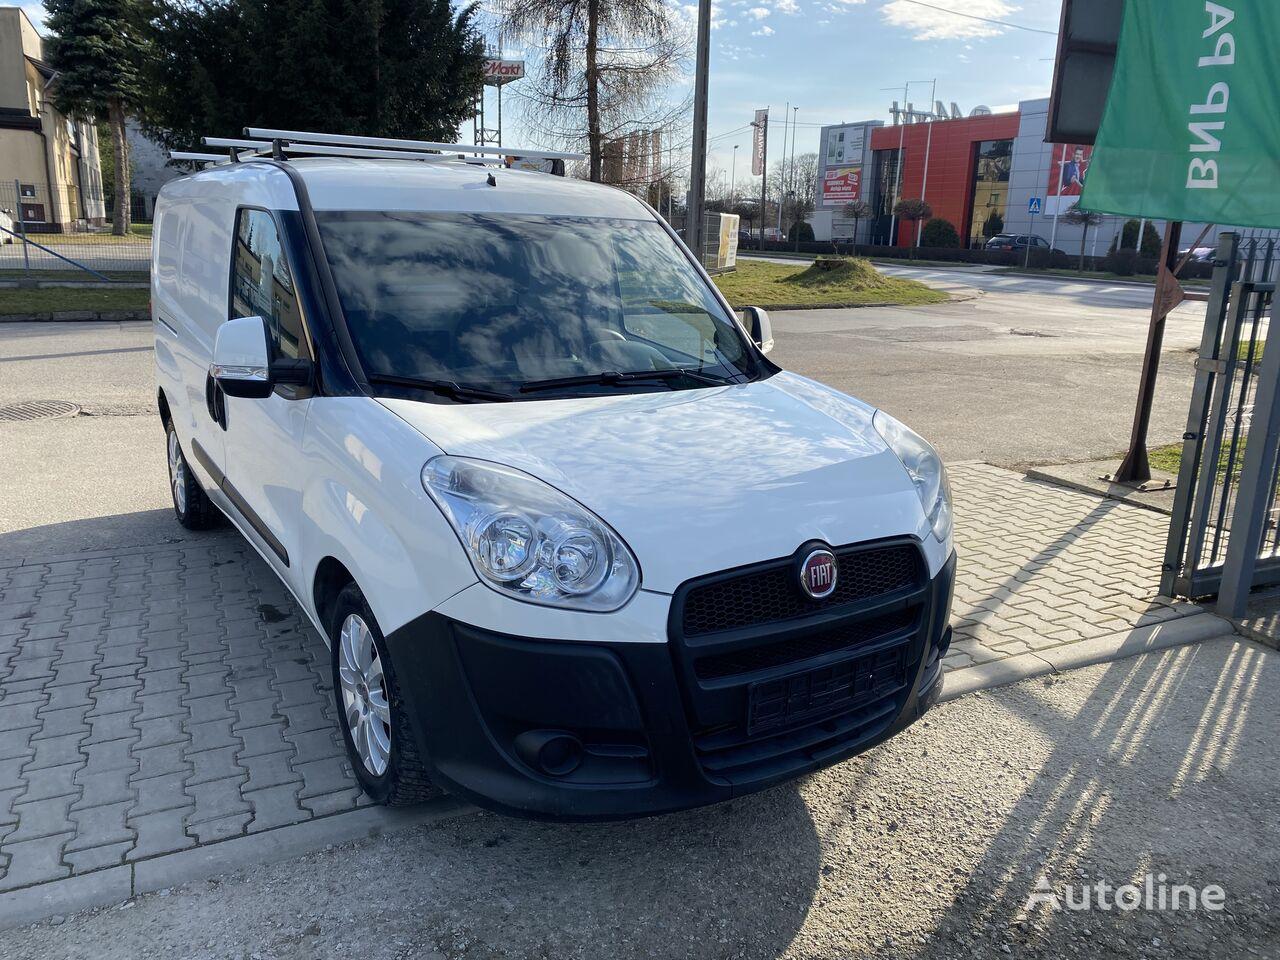 FIAT Doblo 1.6 furgoneta pequeña